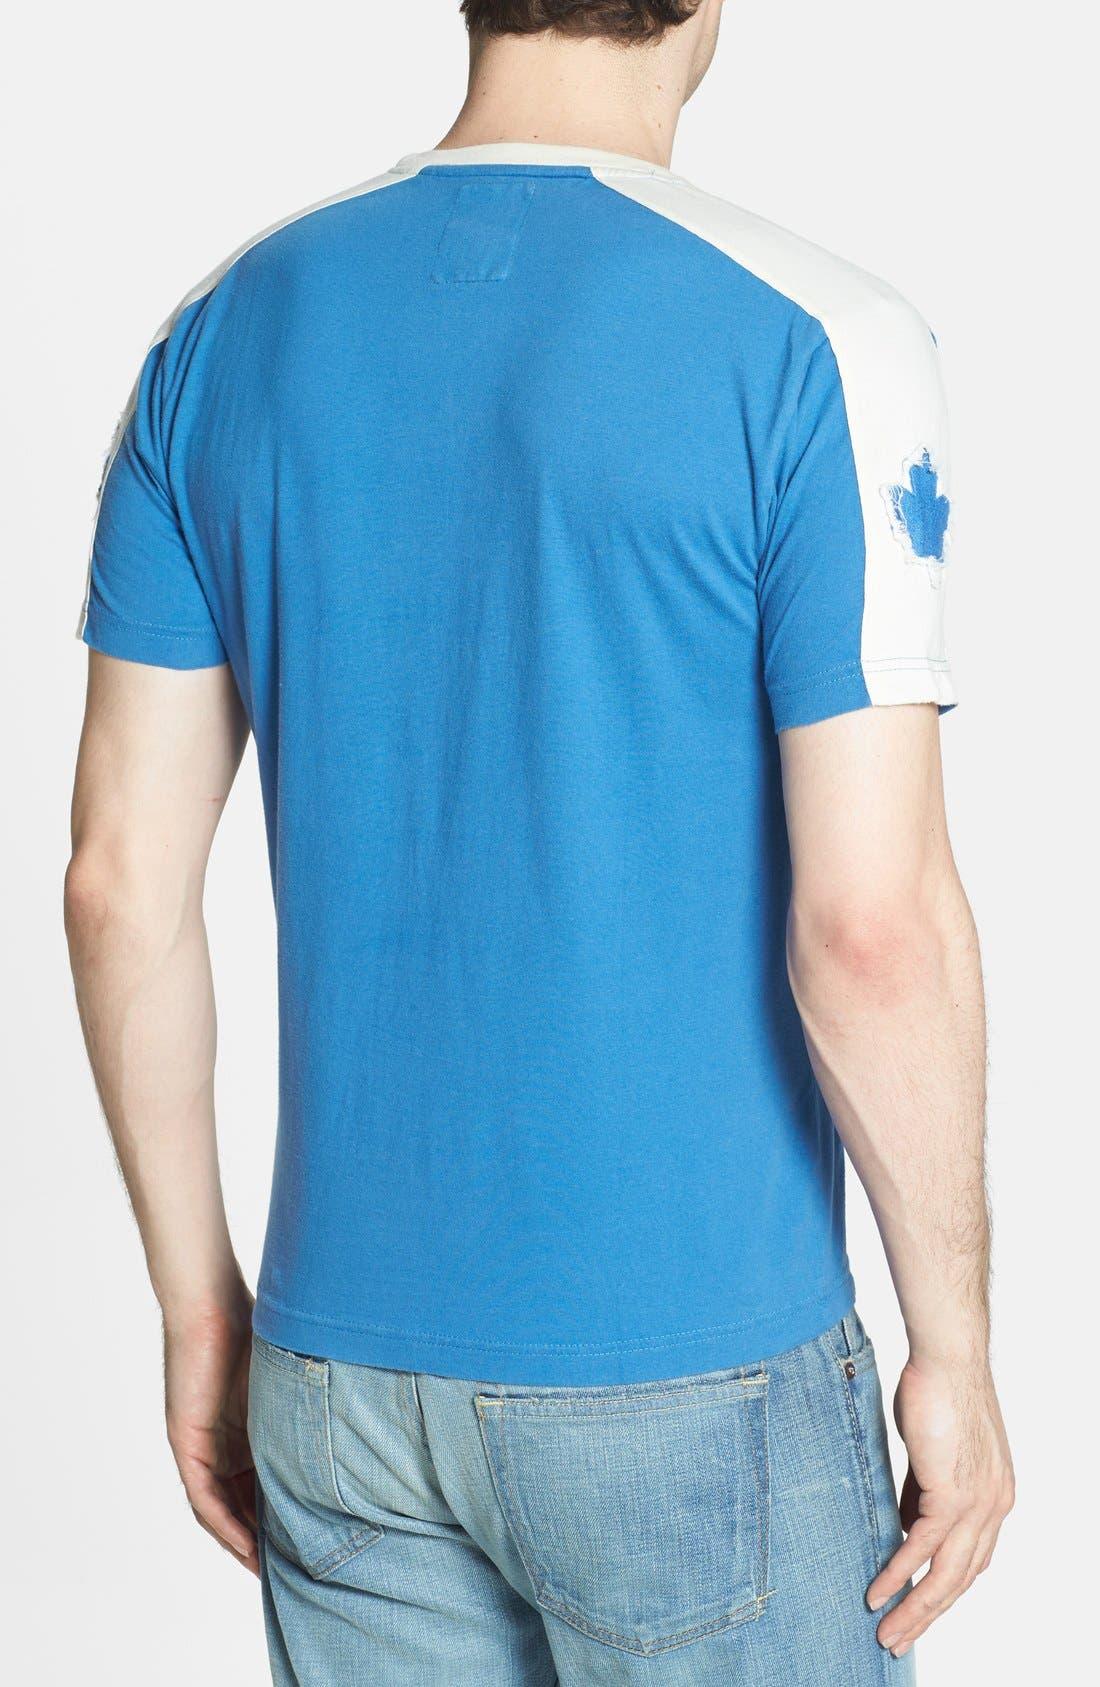 'Toronto Maple Leafs' T-Shirt,                             Alternate thumbnail 4, color,                             450